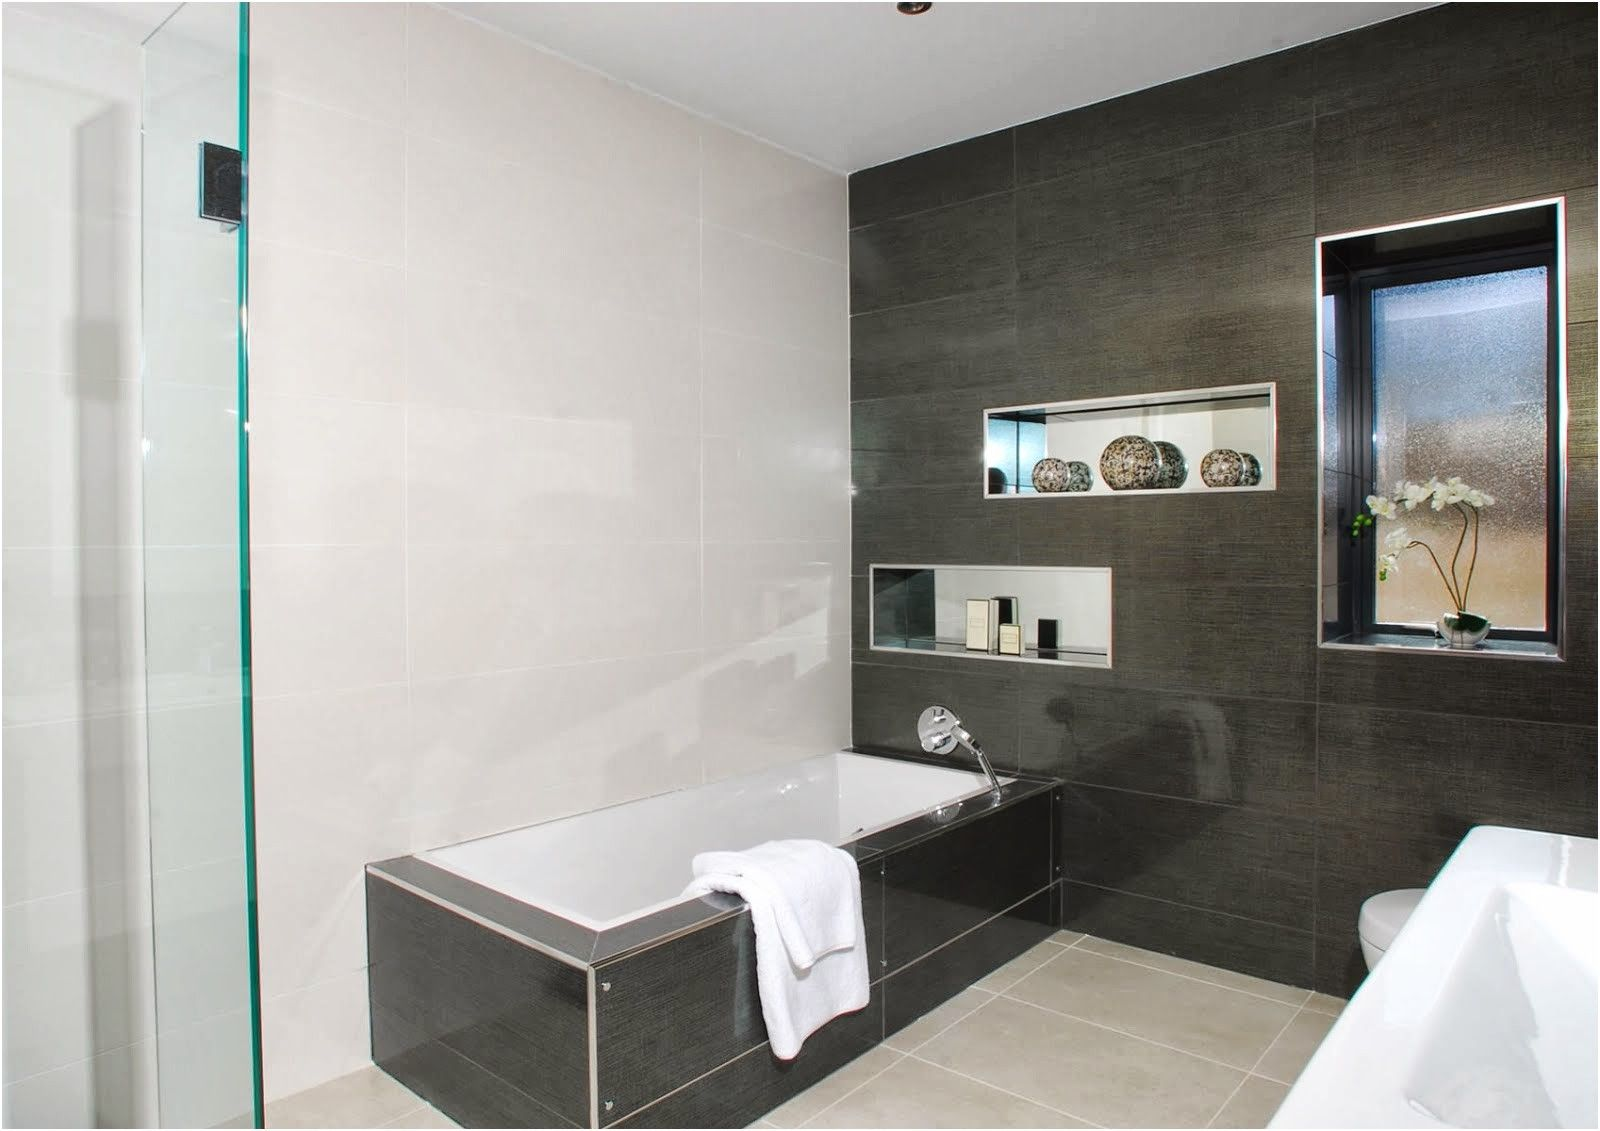 bathroom design ideas uk from Bathroom Designs Uk ...